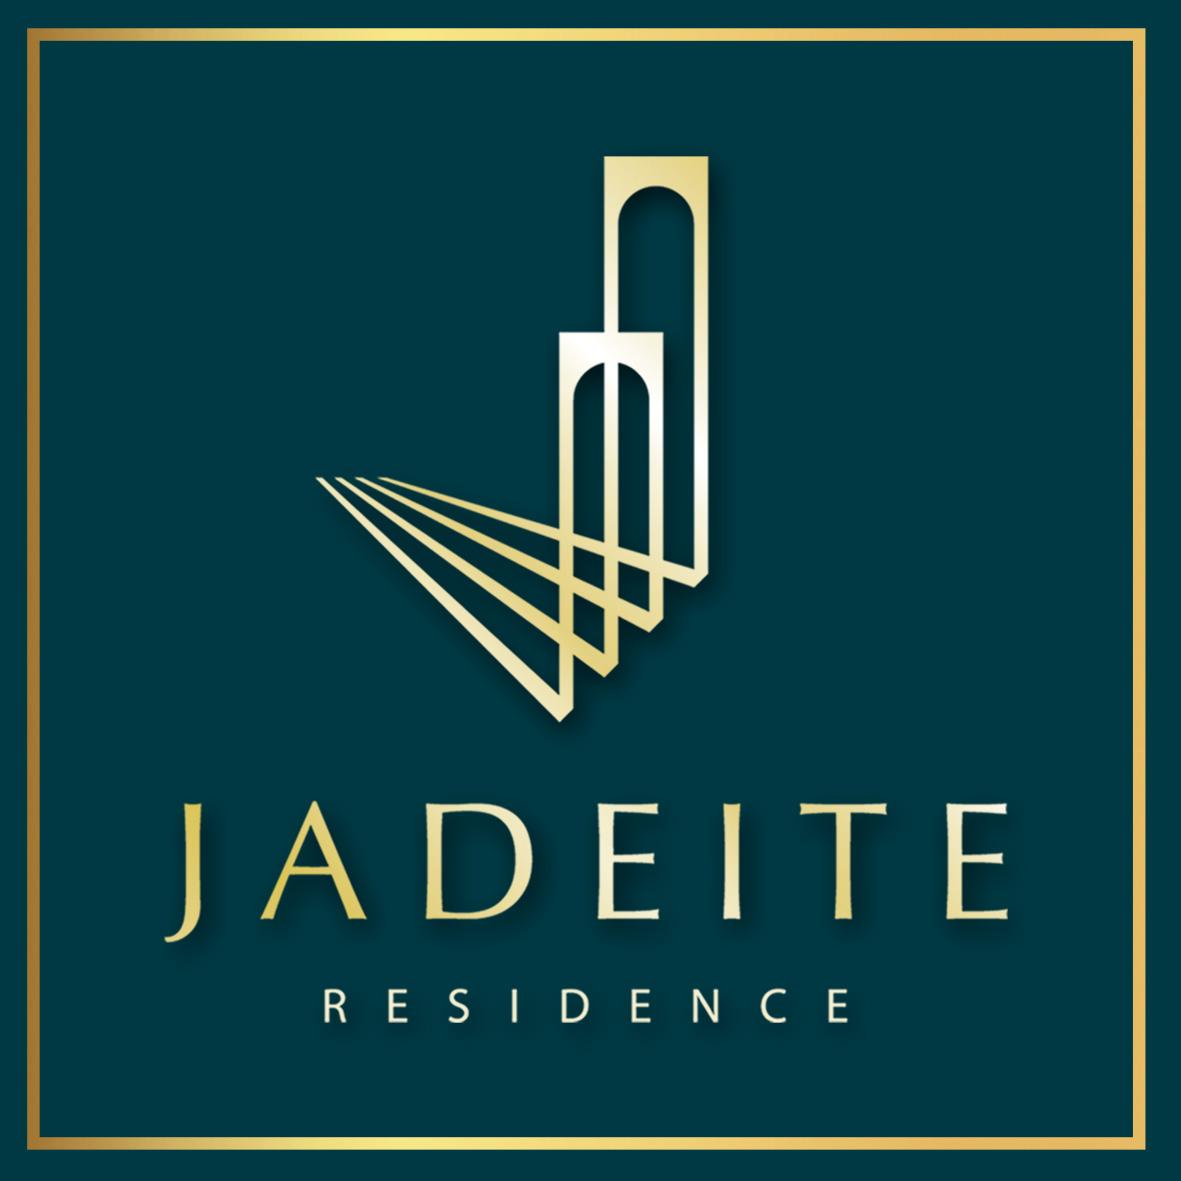 Jadeite BSD City